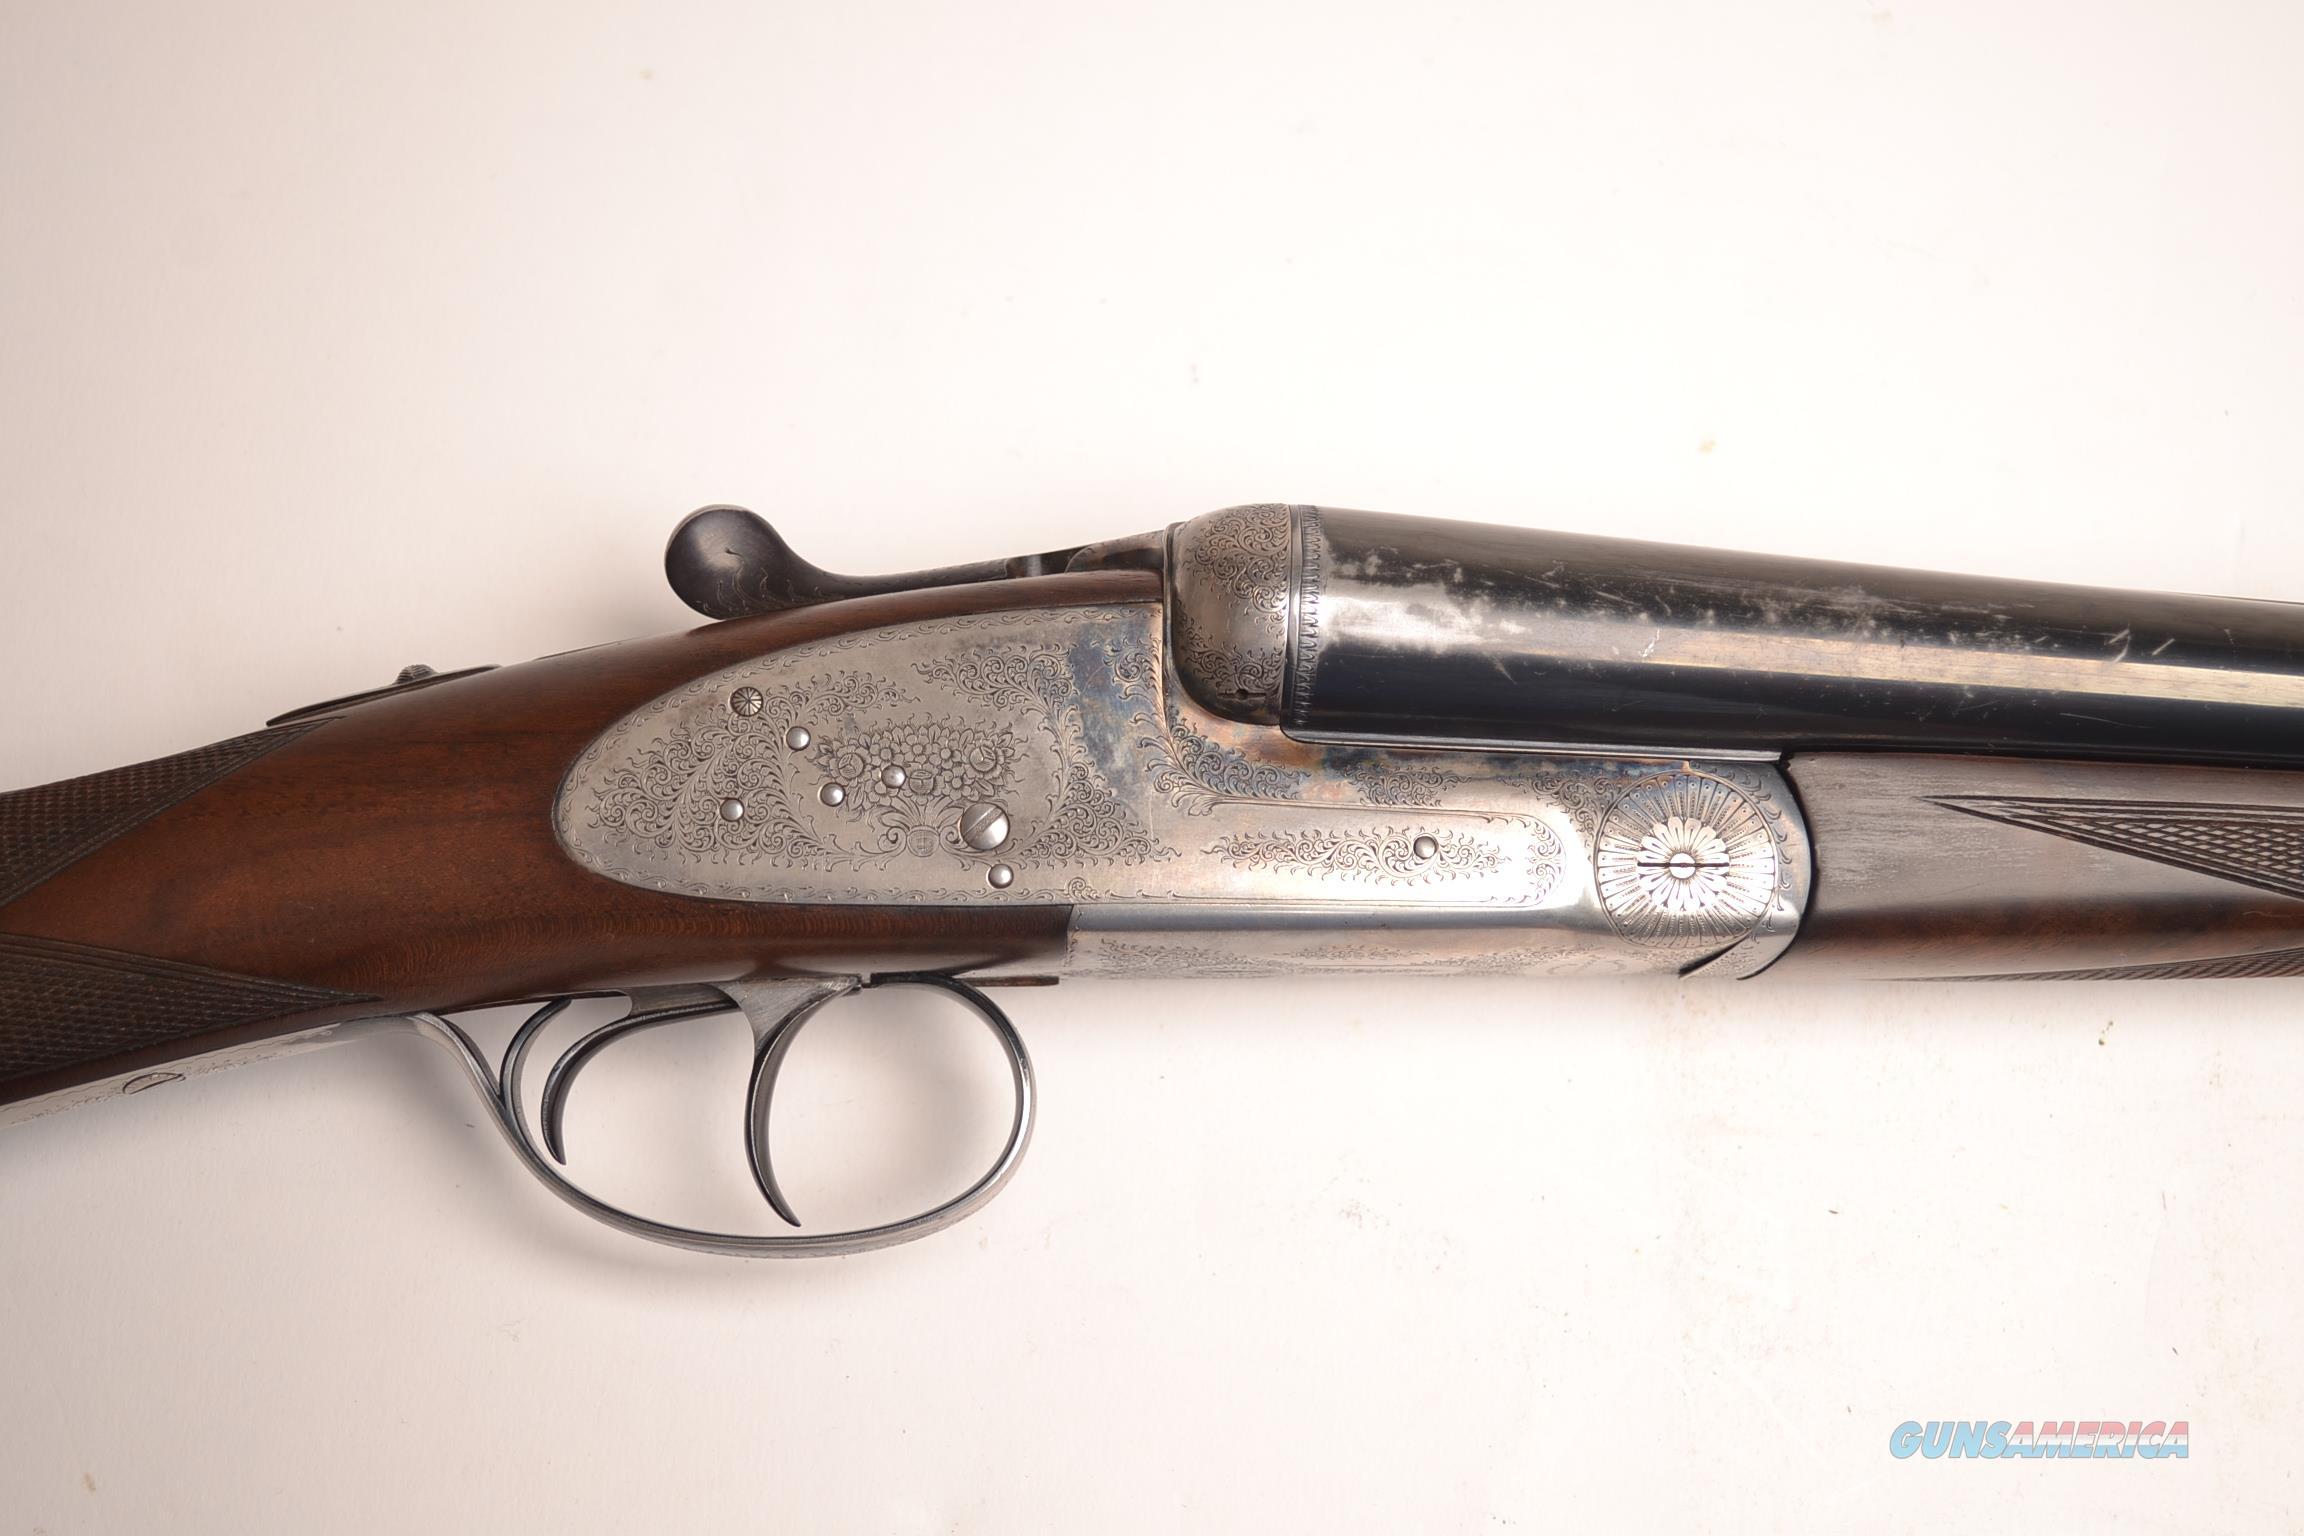 Arrieta Co. - SxS SLE  Guns > Shotguns > Arrieta Shotguns